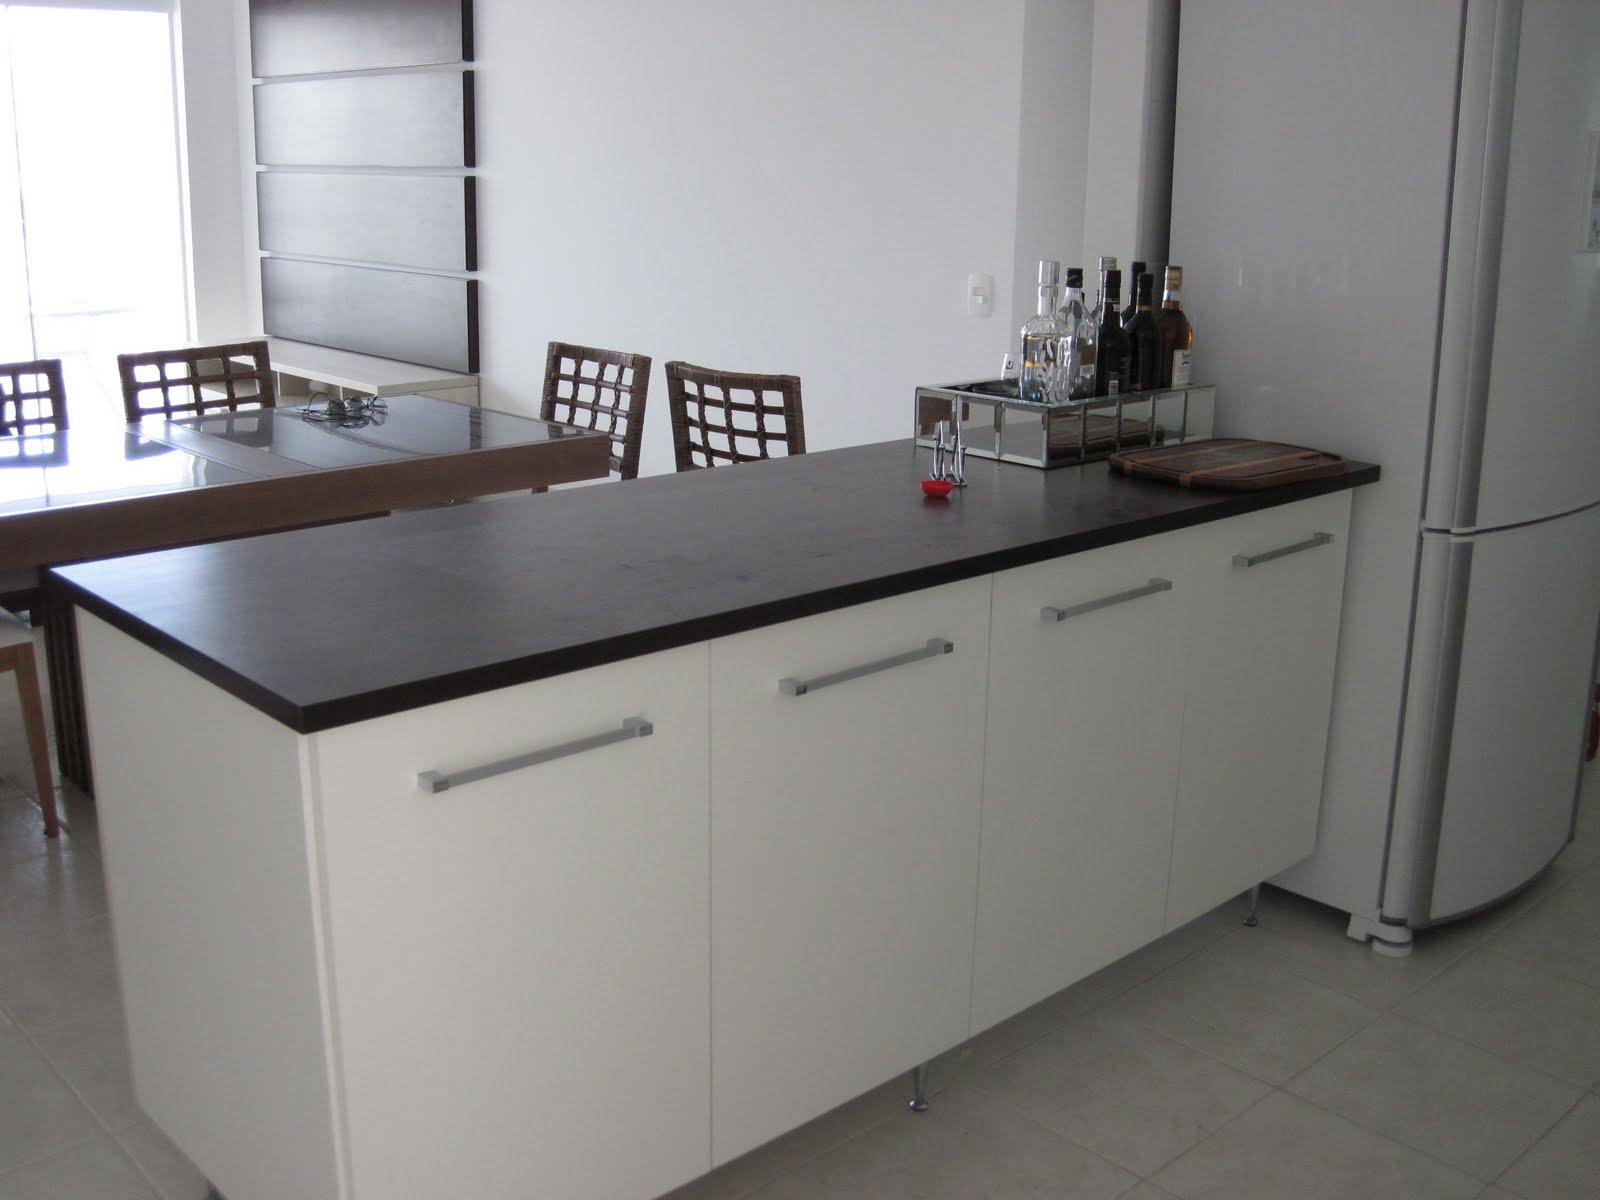 #575D74 MARCENARIA ADEGUATO 1600x1200 px Armario De Cozinha Compacta Mdf #1969 imagens